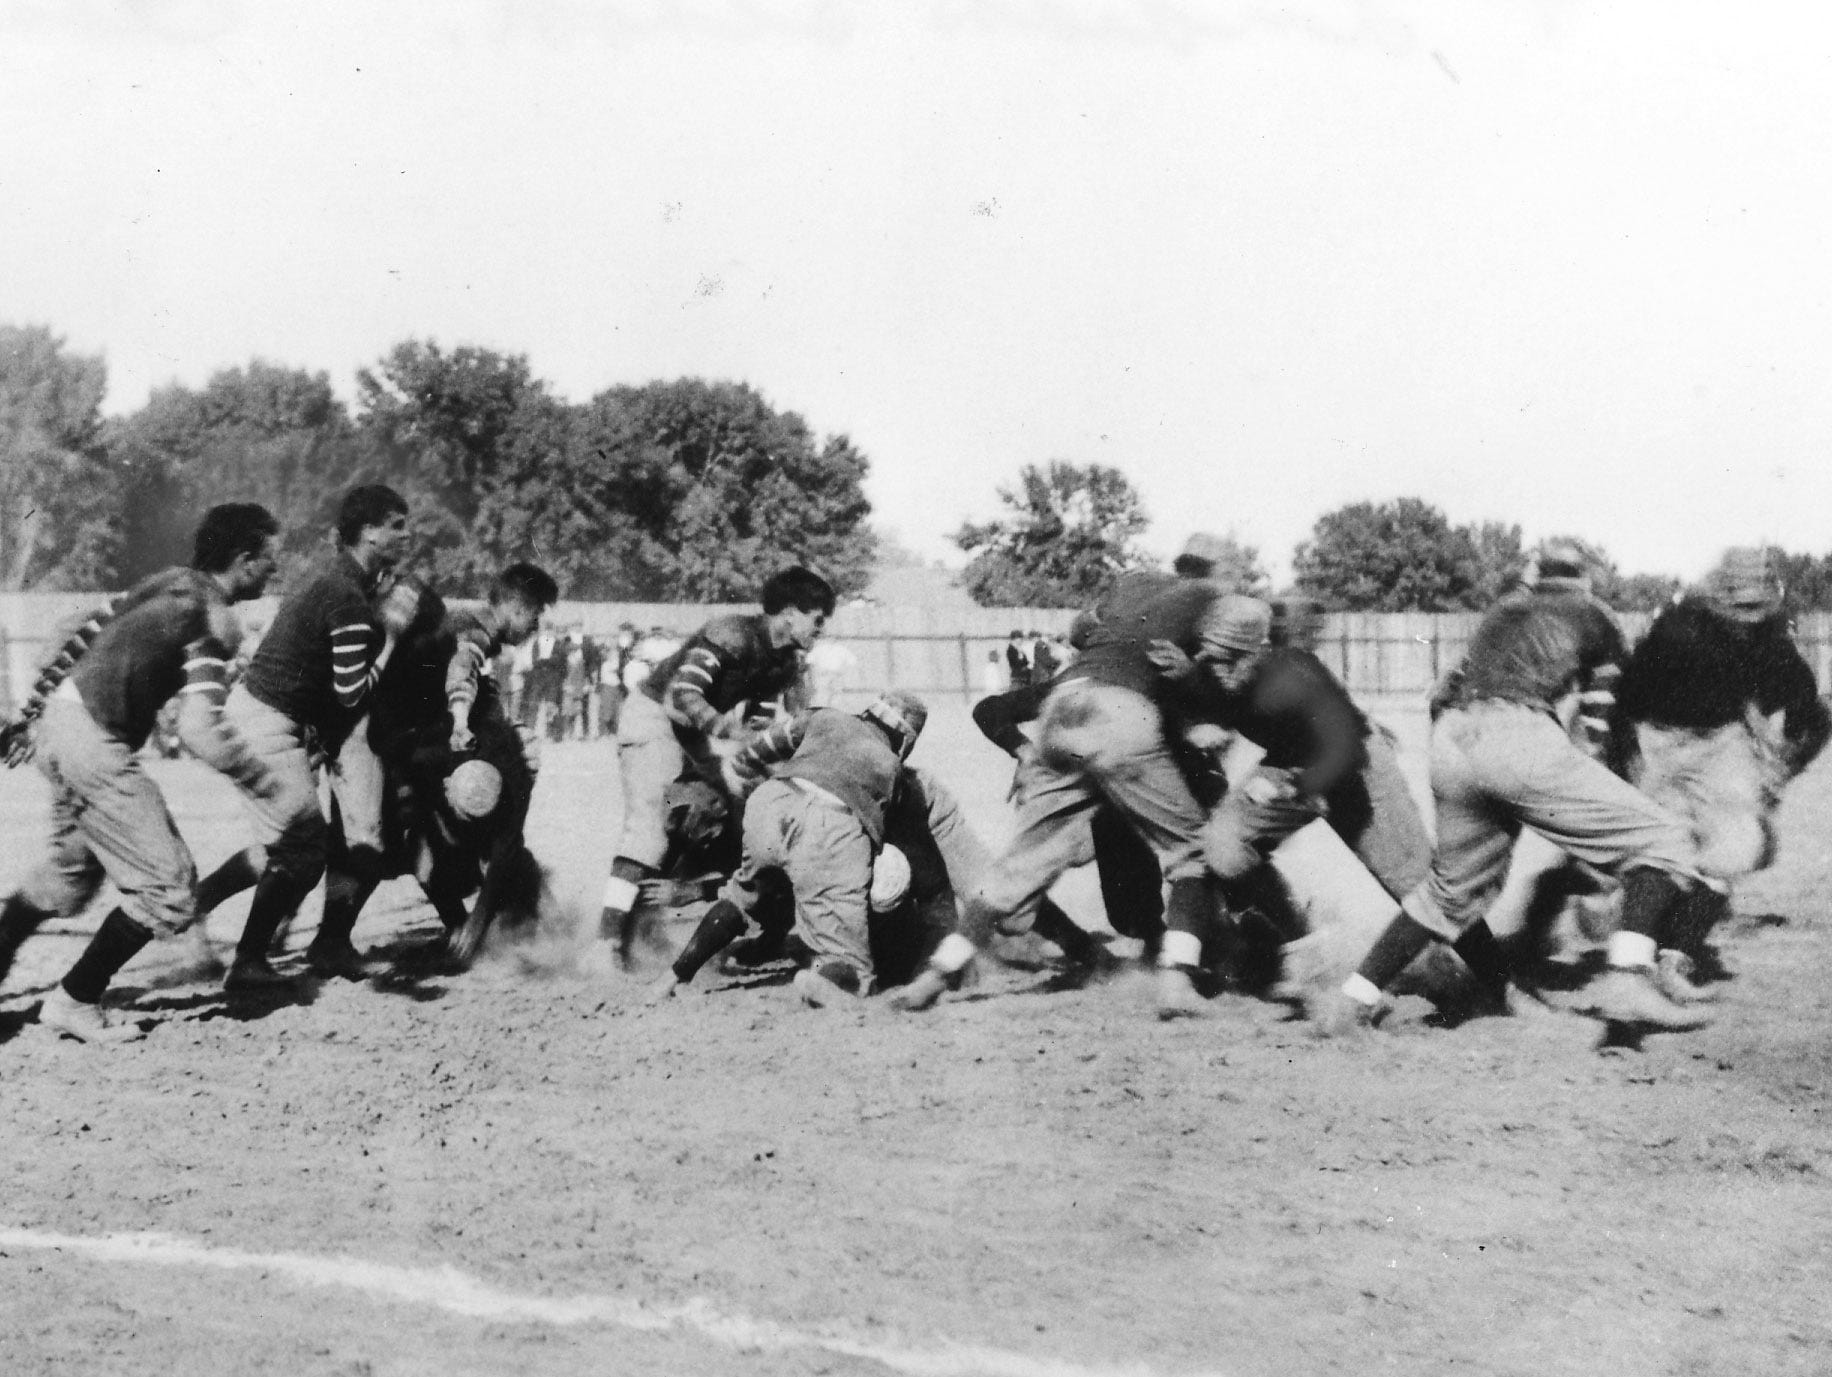 Phoenix Union High School vs Phoenix Indian School in 1914.